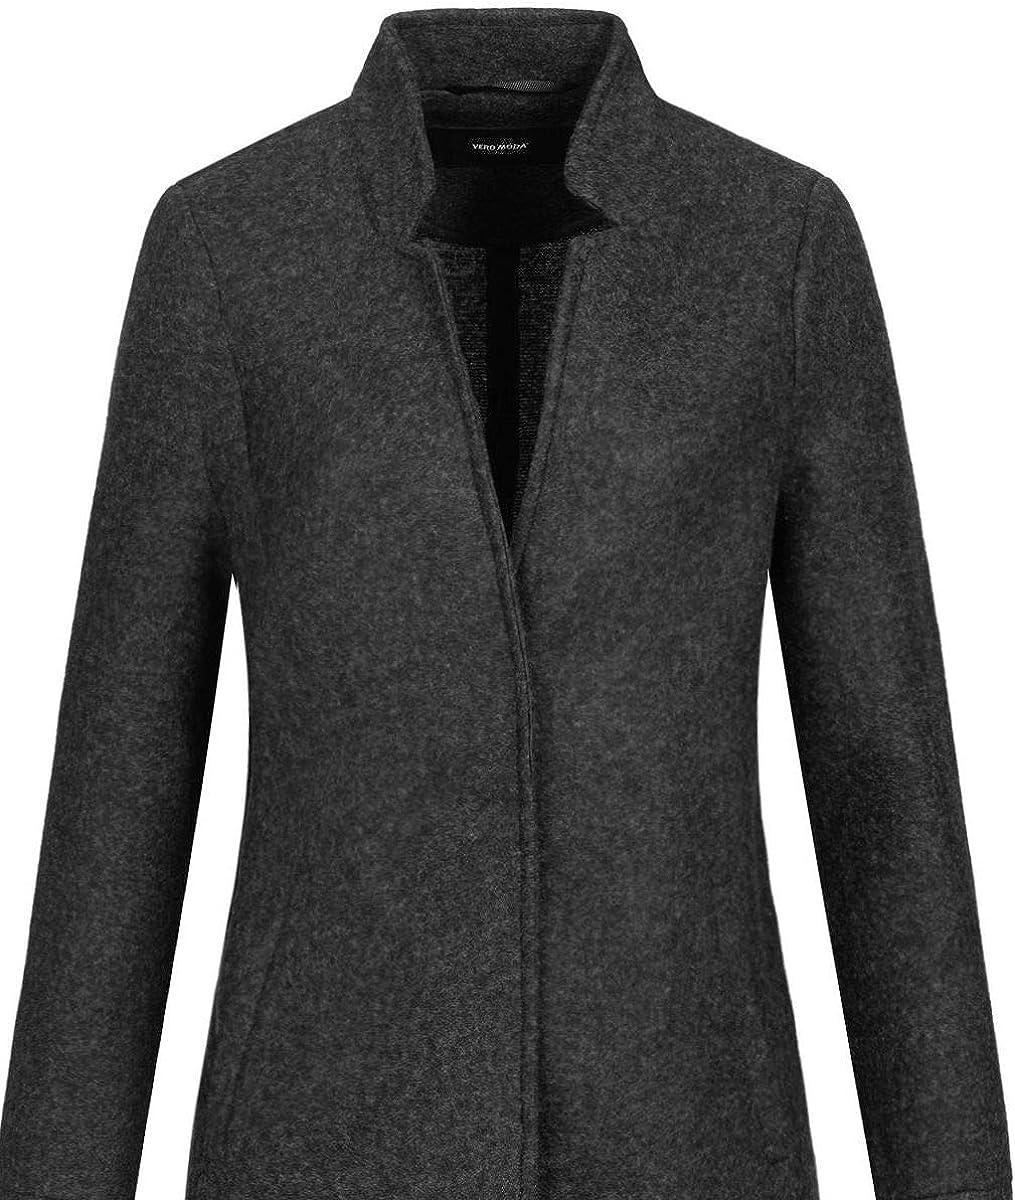 VERO MODA Damen VMVERODONA Trenchcoat COL Wollmischungs-Mantel